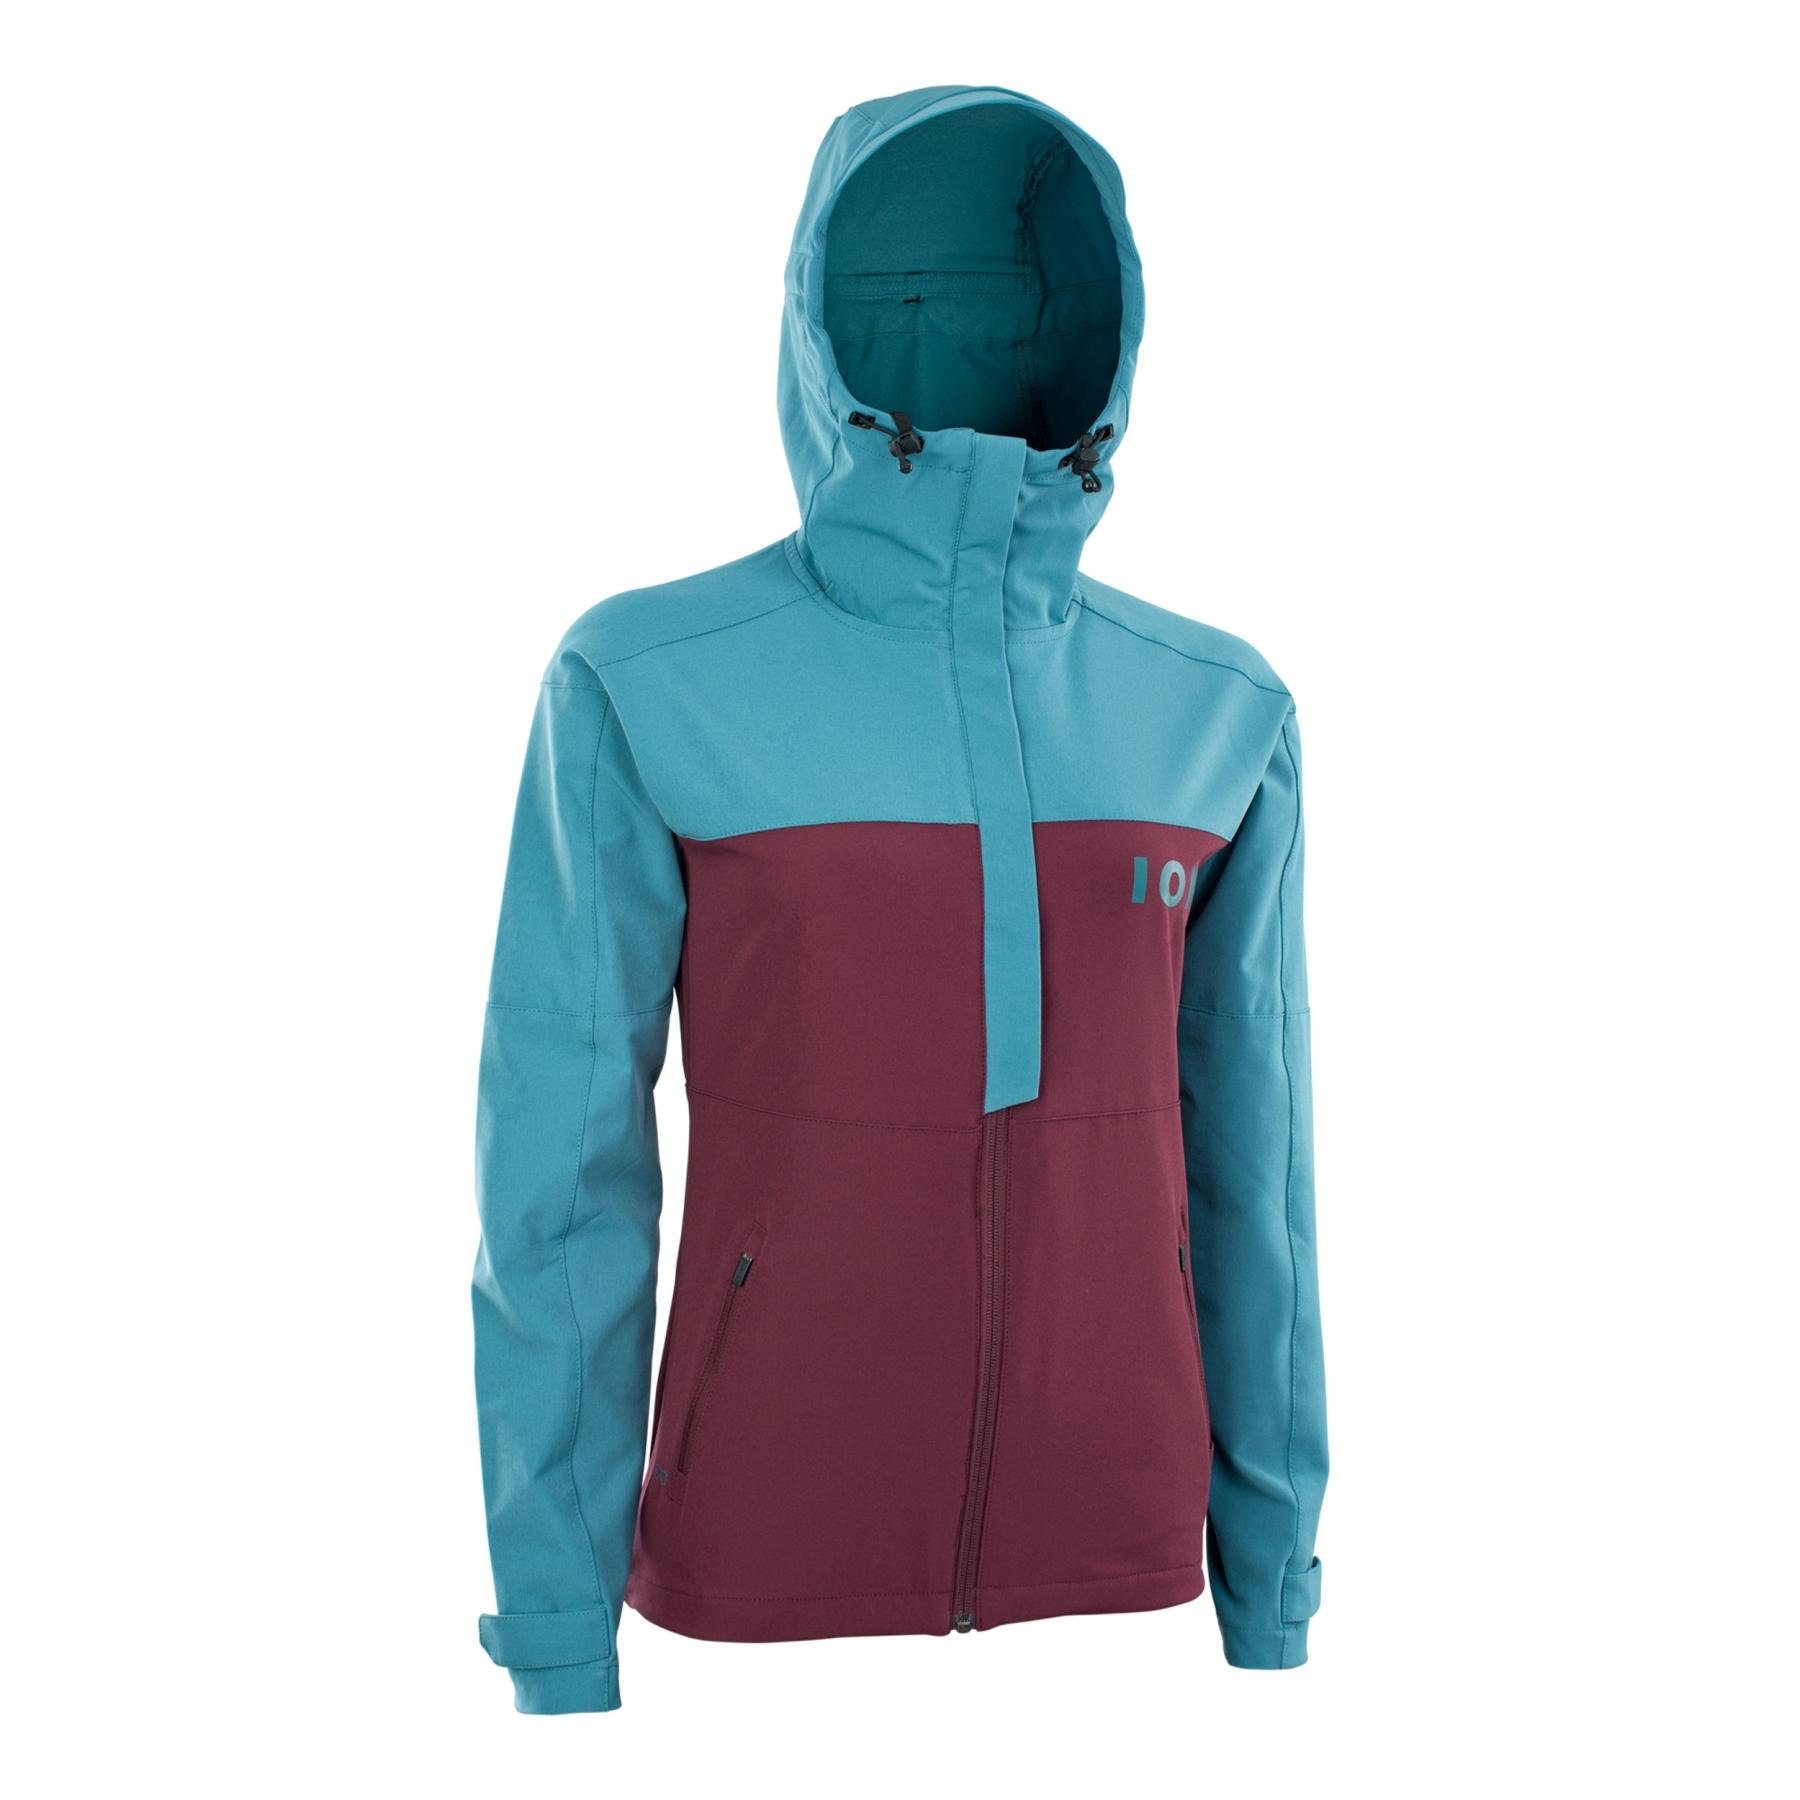 ION Bike Softshell Jacket Shelter Women - laguna green